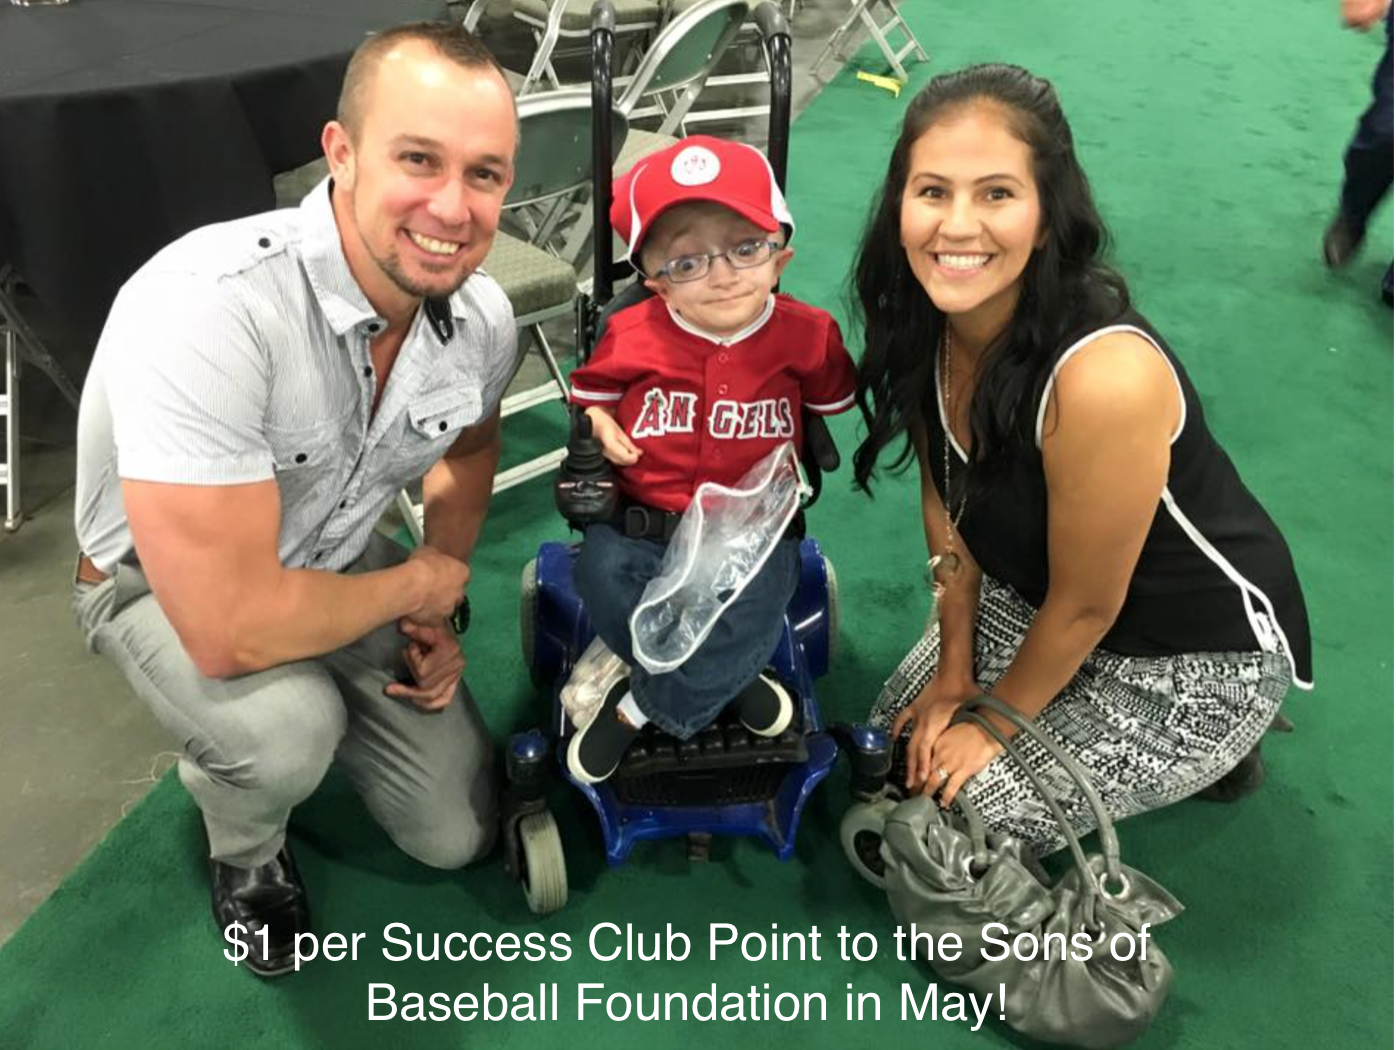 Sons of Baseball Foundation